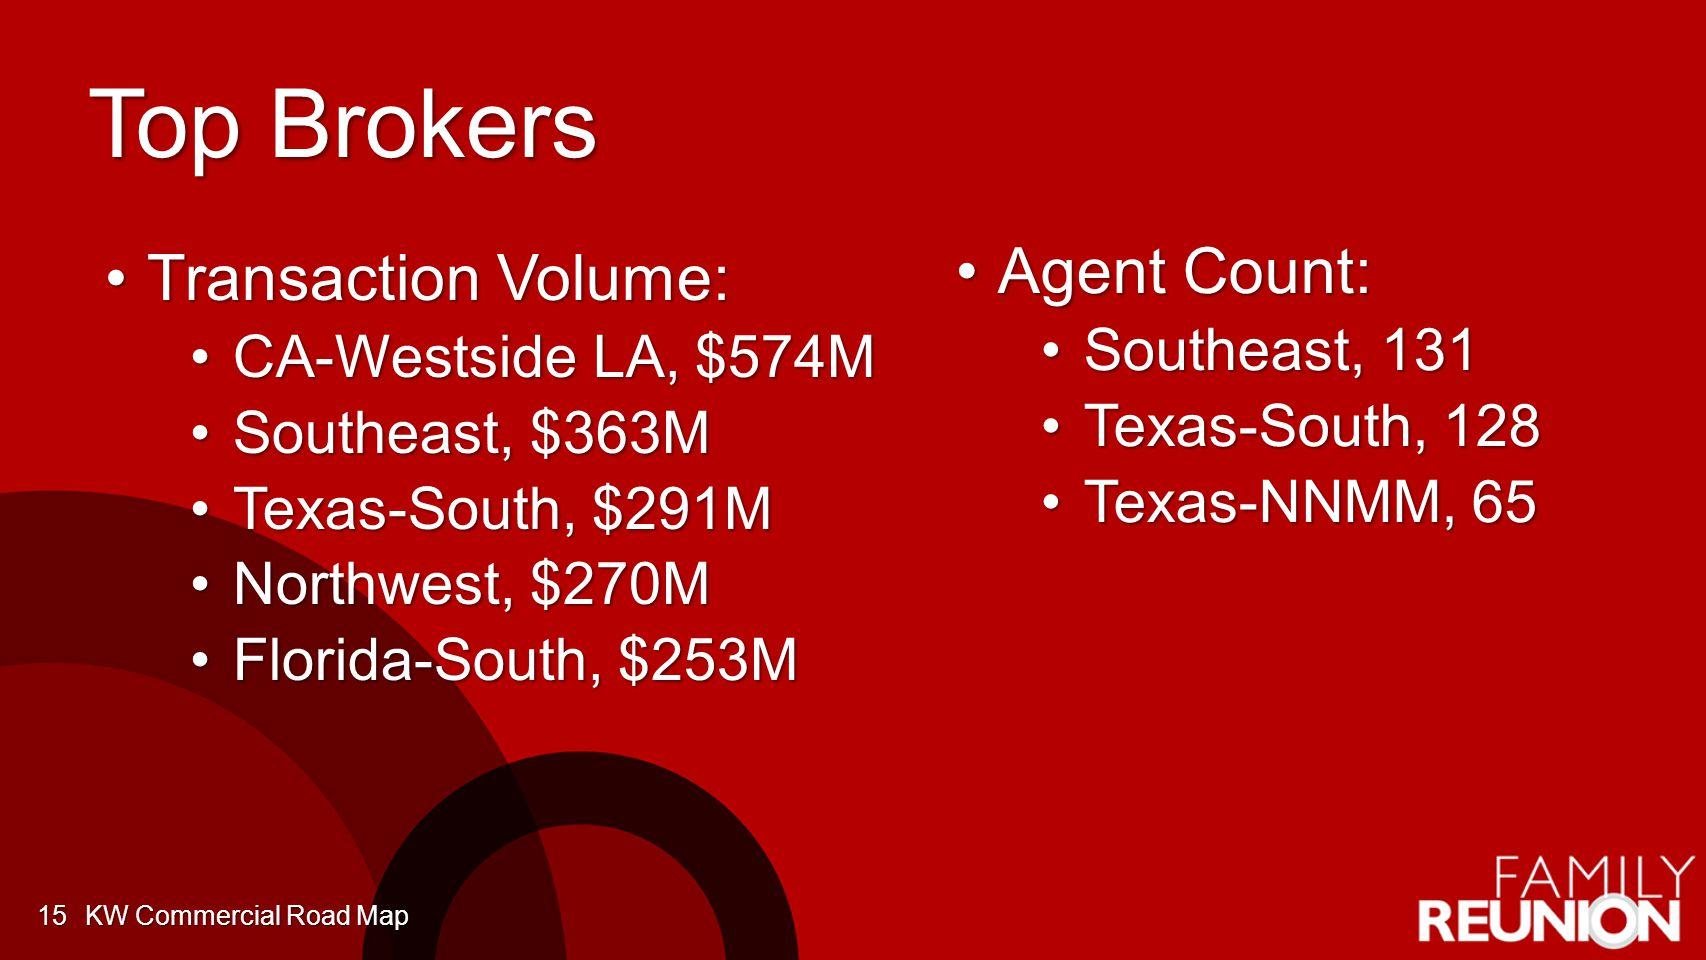 Top Brokers Transaction Volume:Transaction Volume: CA-Westside LA, $574MCA-Westside LA, $574M Southeast, $363MSoutheast, $363M Texas-South, $291MTexas-South, $291M Northwest, $270MNorthwest, $270M Florida-South, $253MFlorida-South, $253M KW Commercial Road Map15 Agent Count:Agent Count: Southeast, 131Southeast, 131 Texas-South, 128Texas-South, 128 Texas-NNMM, 65Texas-NNMM, 65